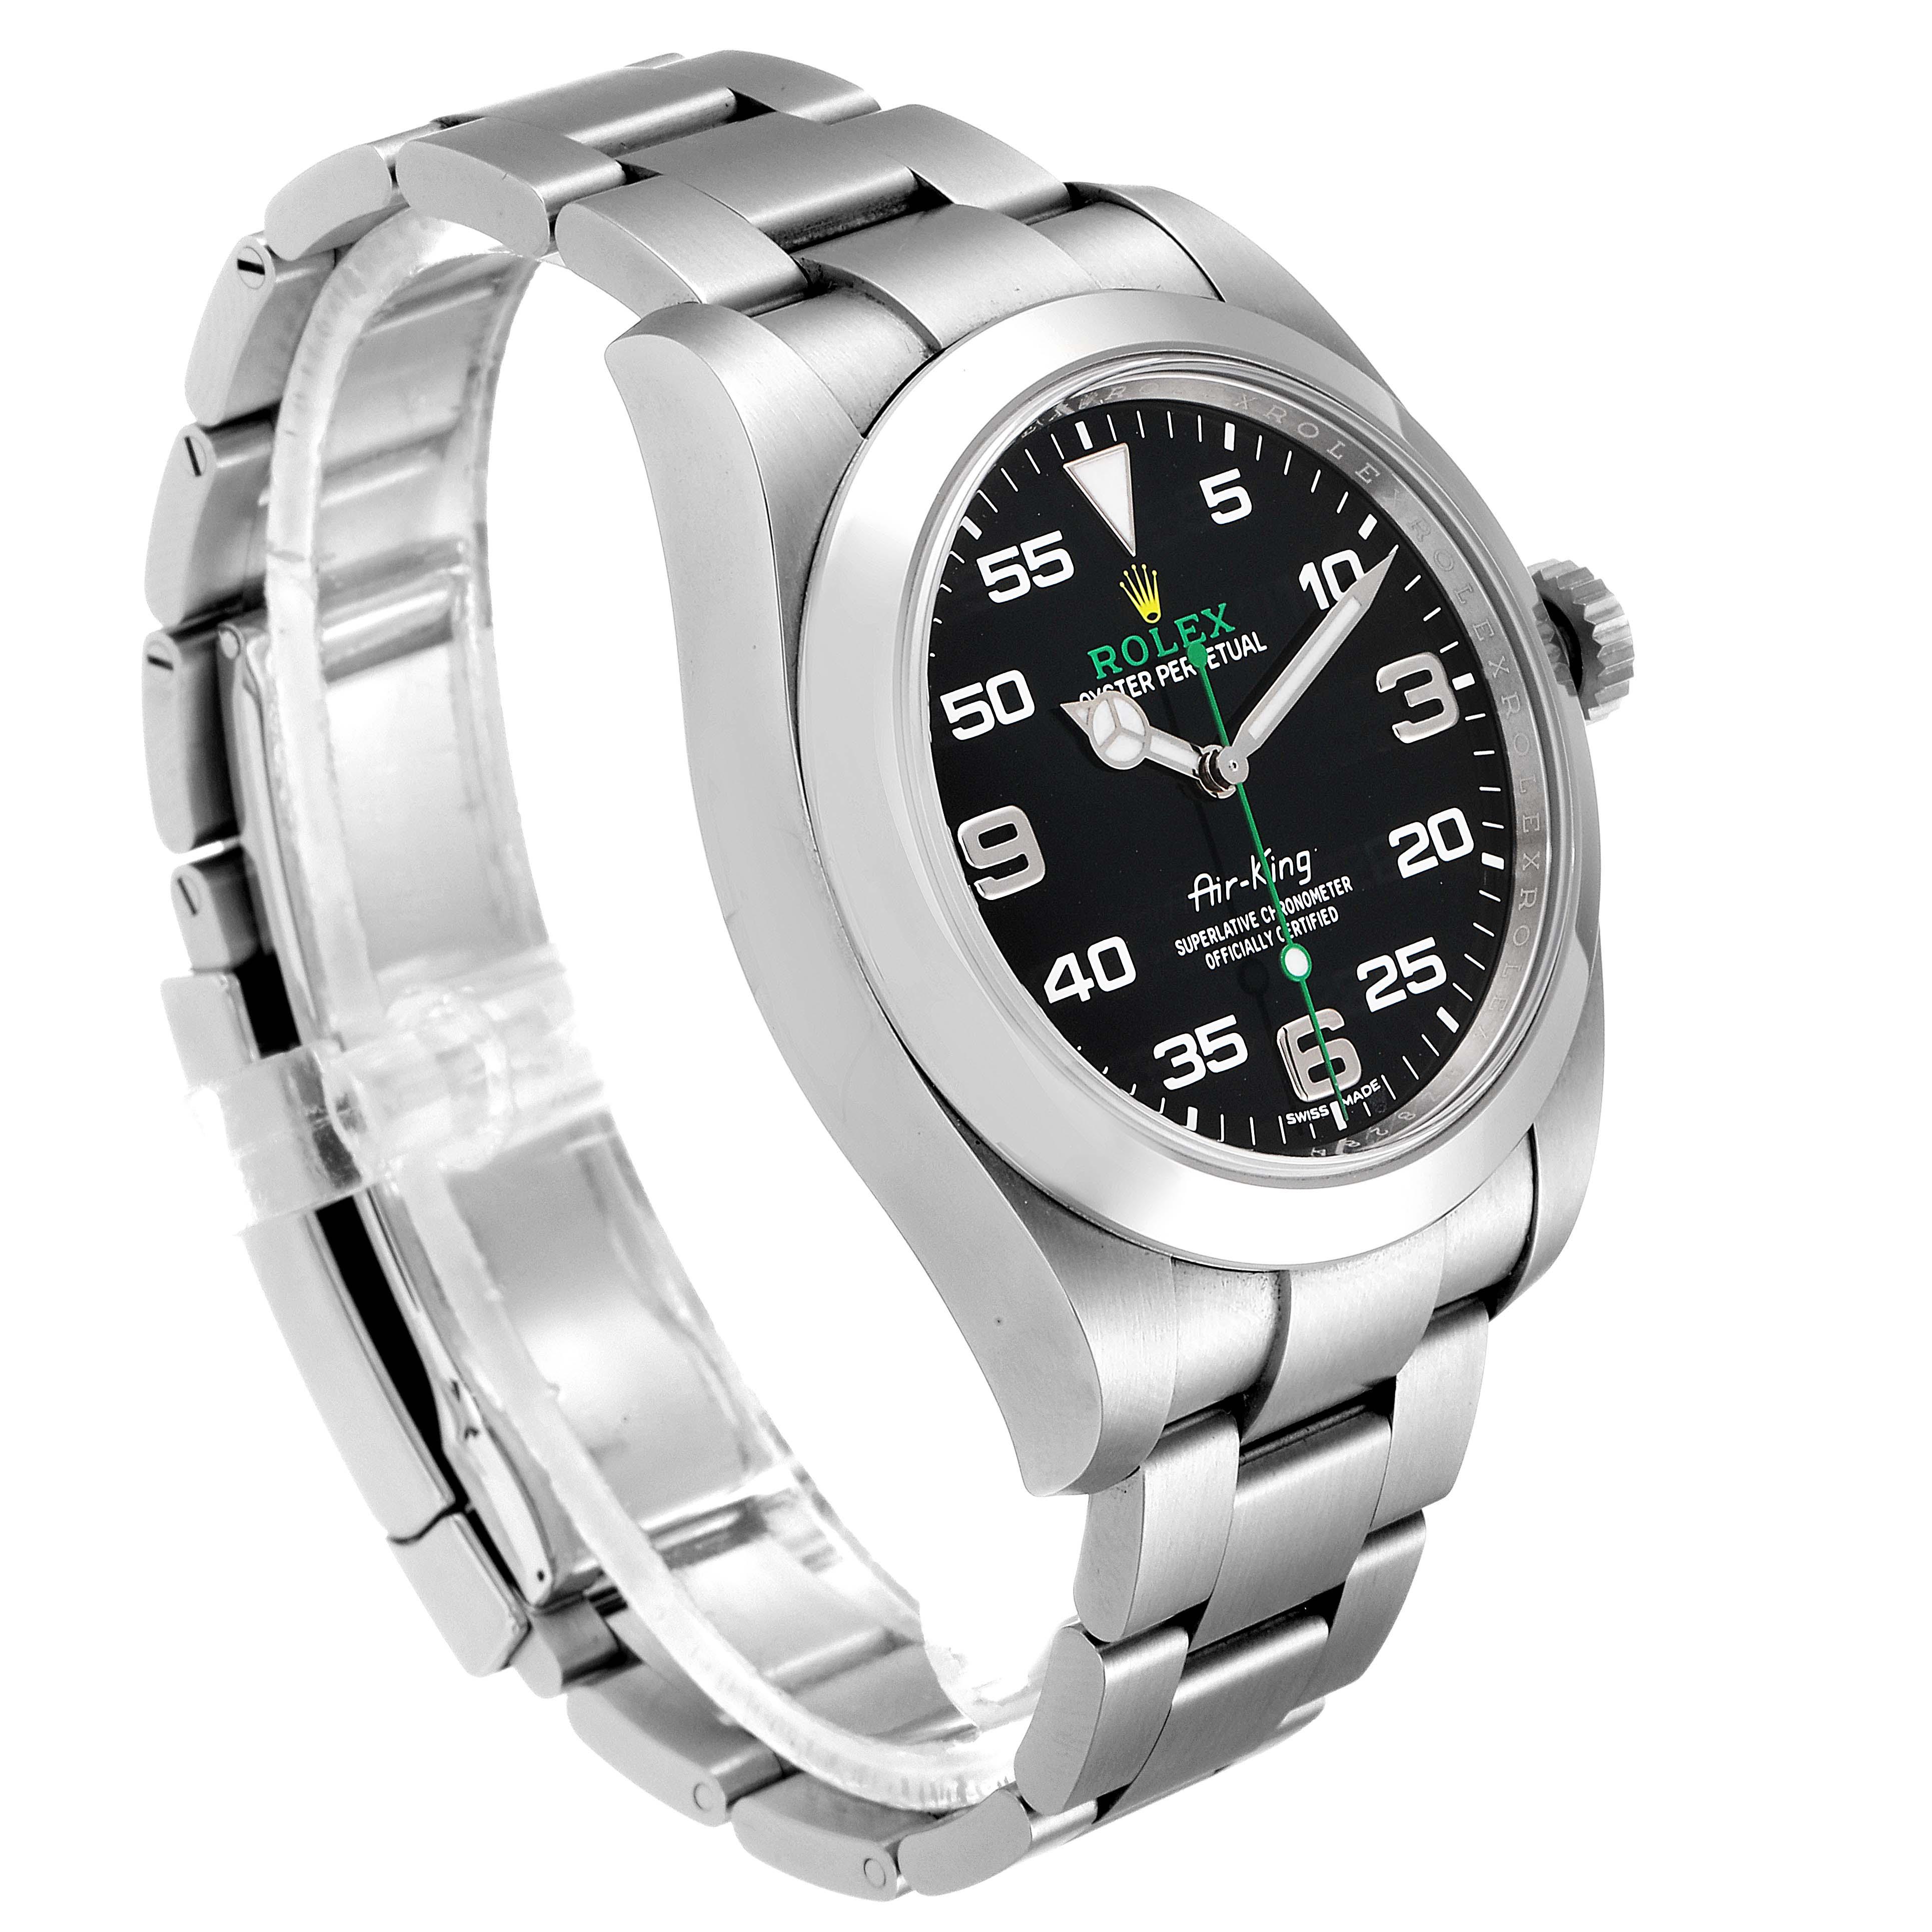 Rolex Oyster Perpetual Air King Black Dial Steel Watch 116900 Box Card Unworn SwissWatchExpo